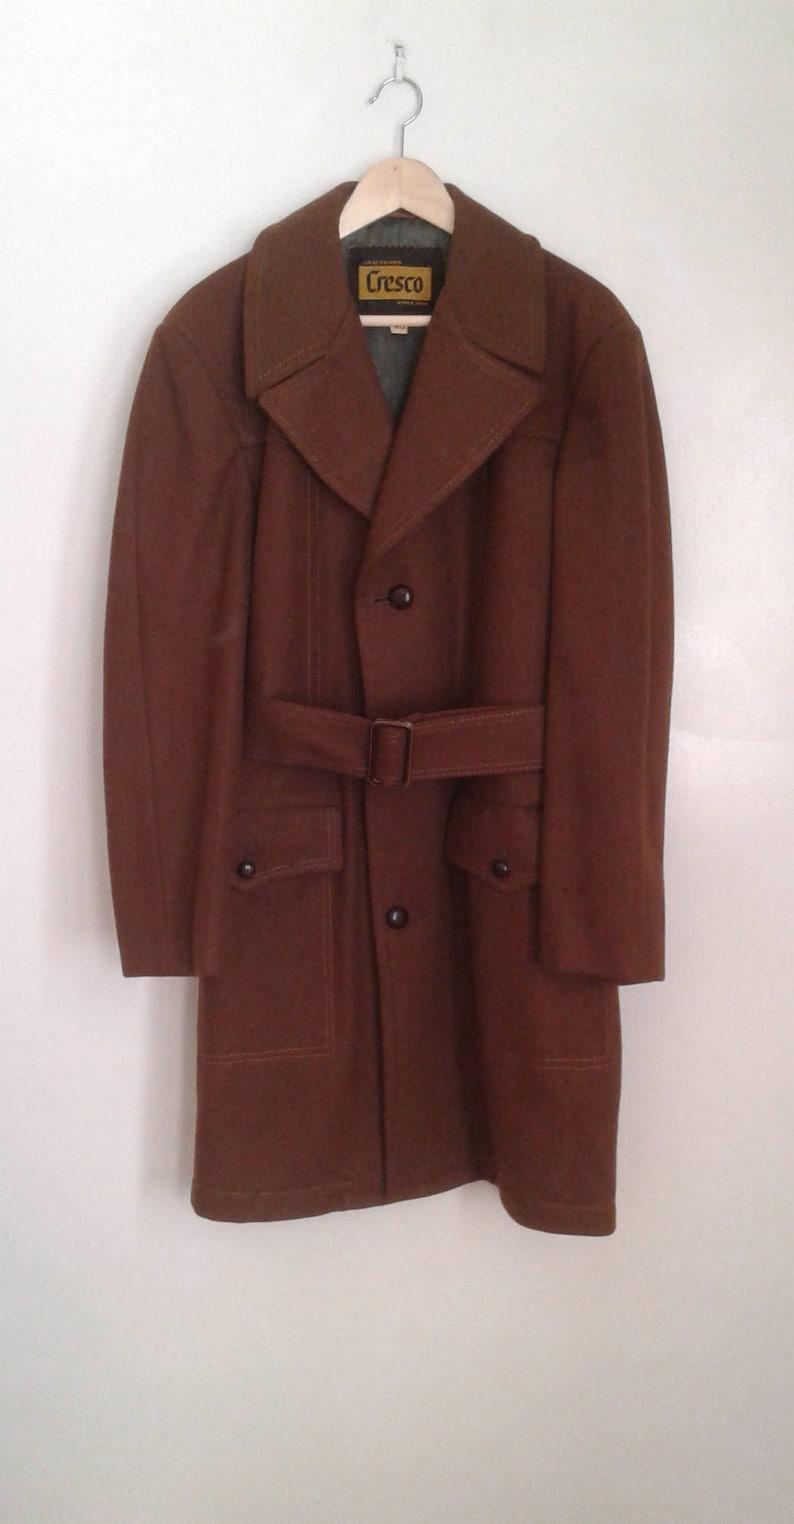 Vintage 1970/'s Cresco Brown Wool Belted Coat Jacket Stitch Detail Sz 40 Mod Dapper